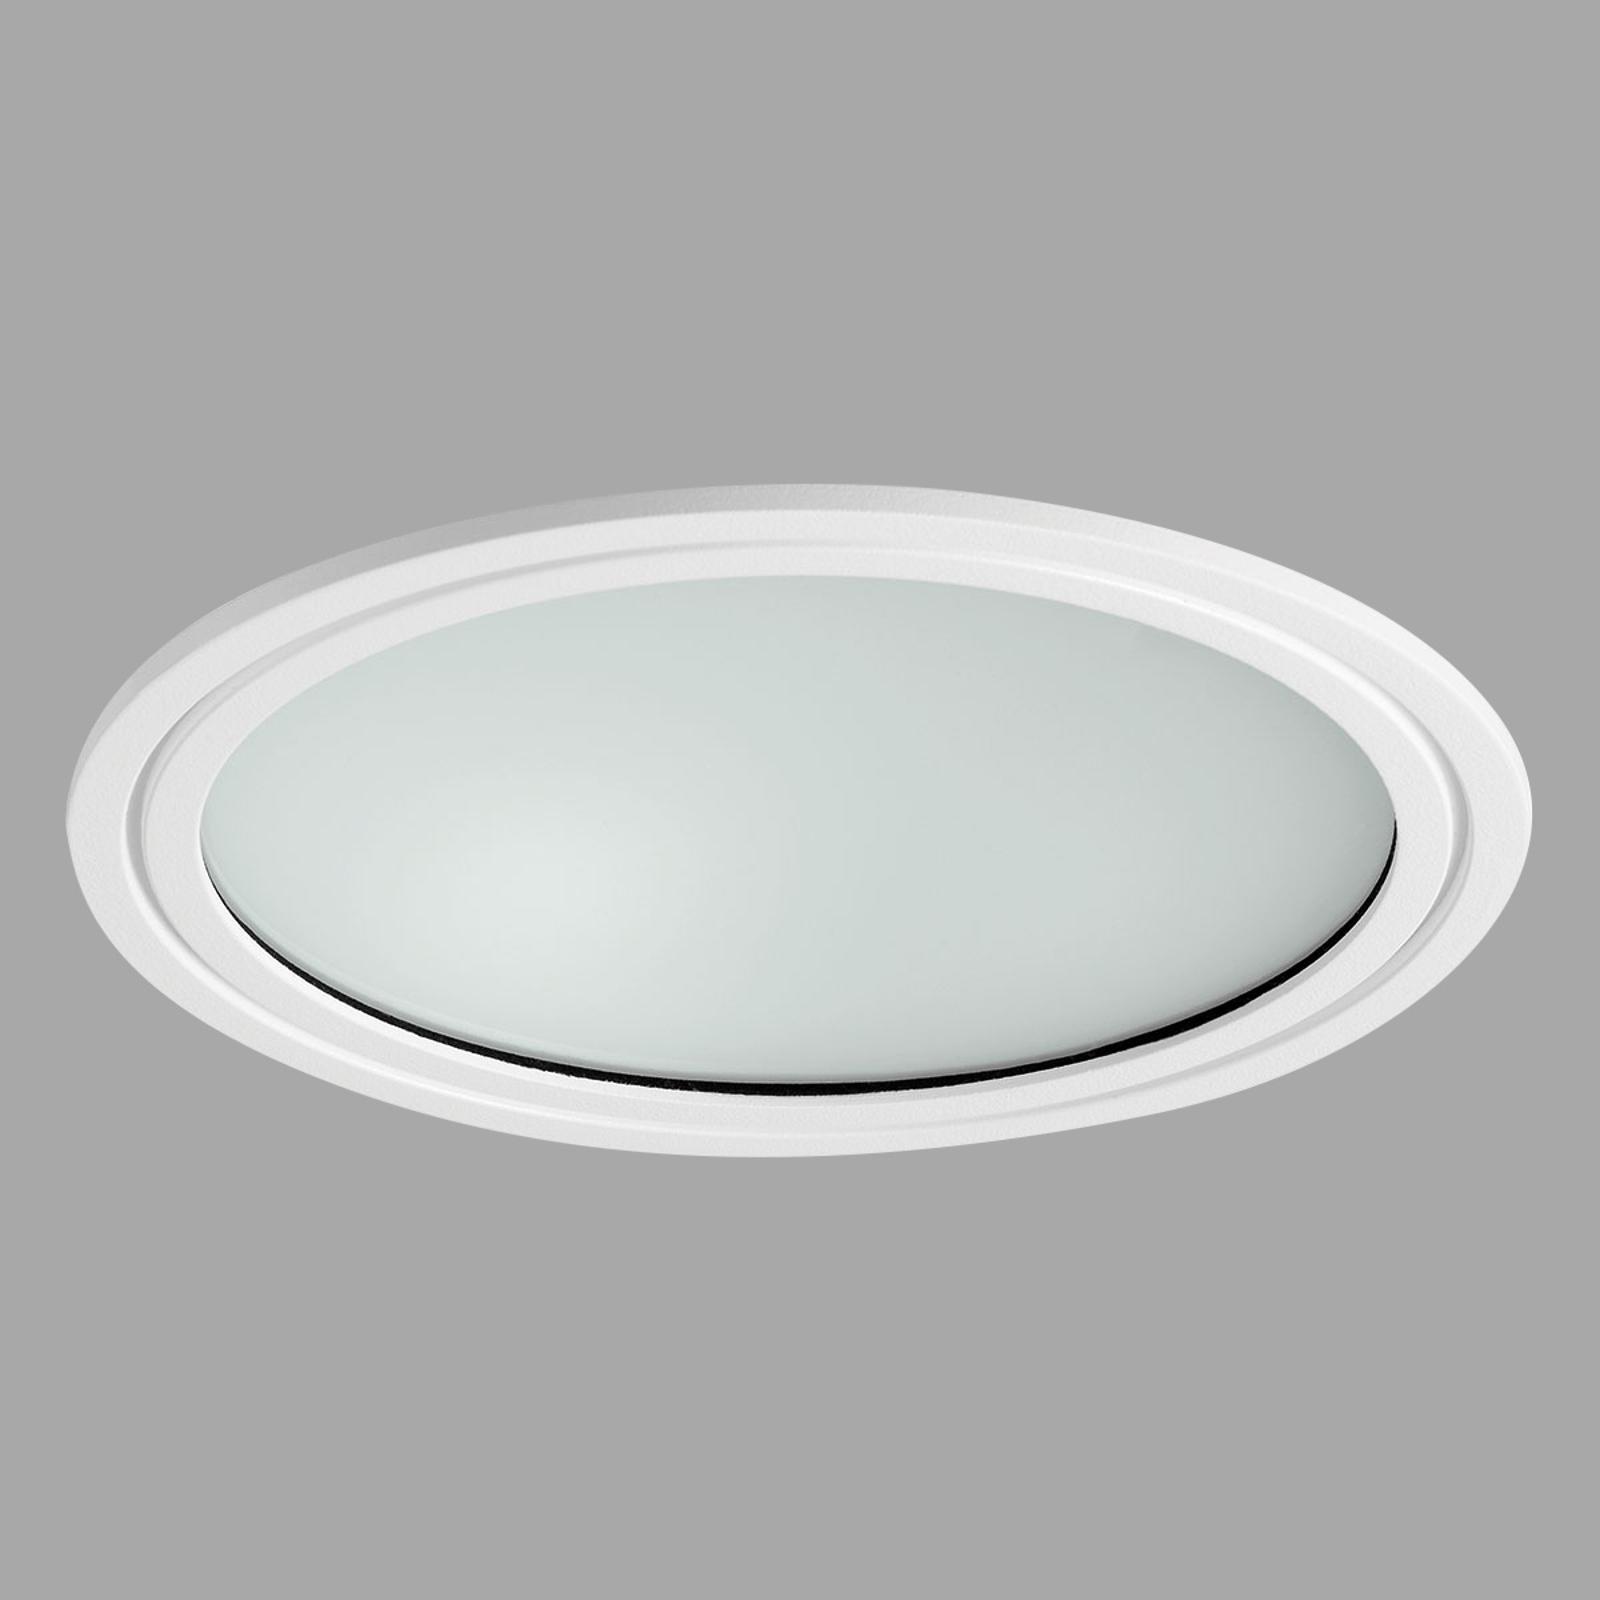 LED-Einbaulampe Prettus M PRO, 74°, 29W, 4.000 K